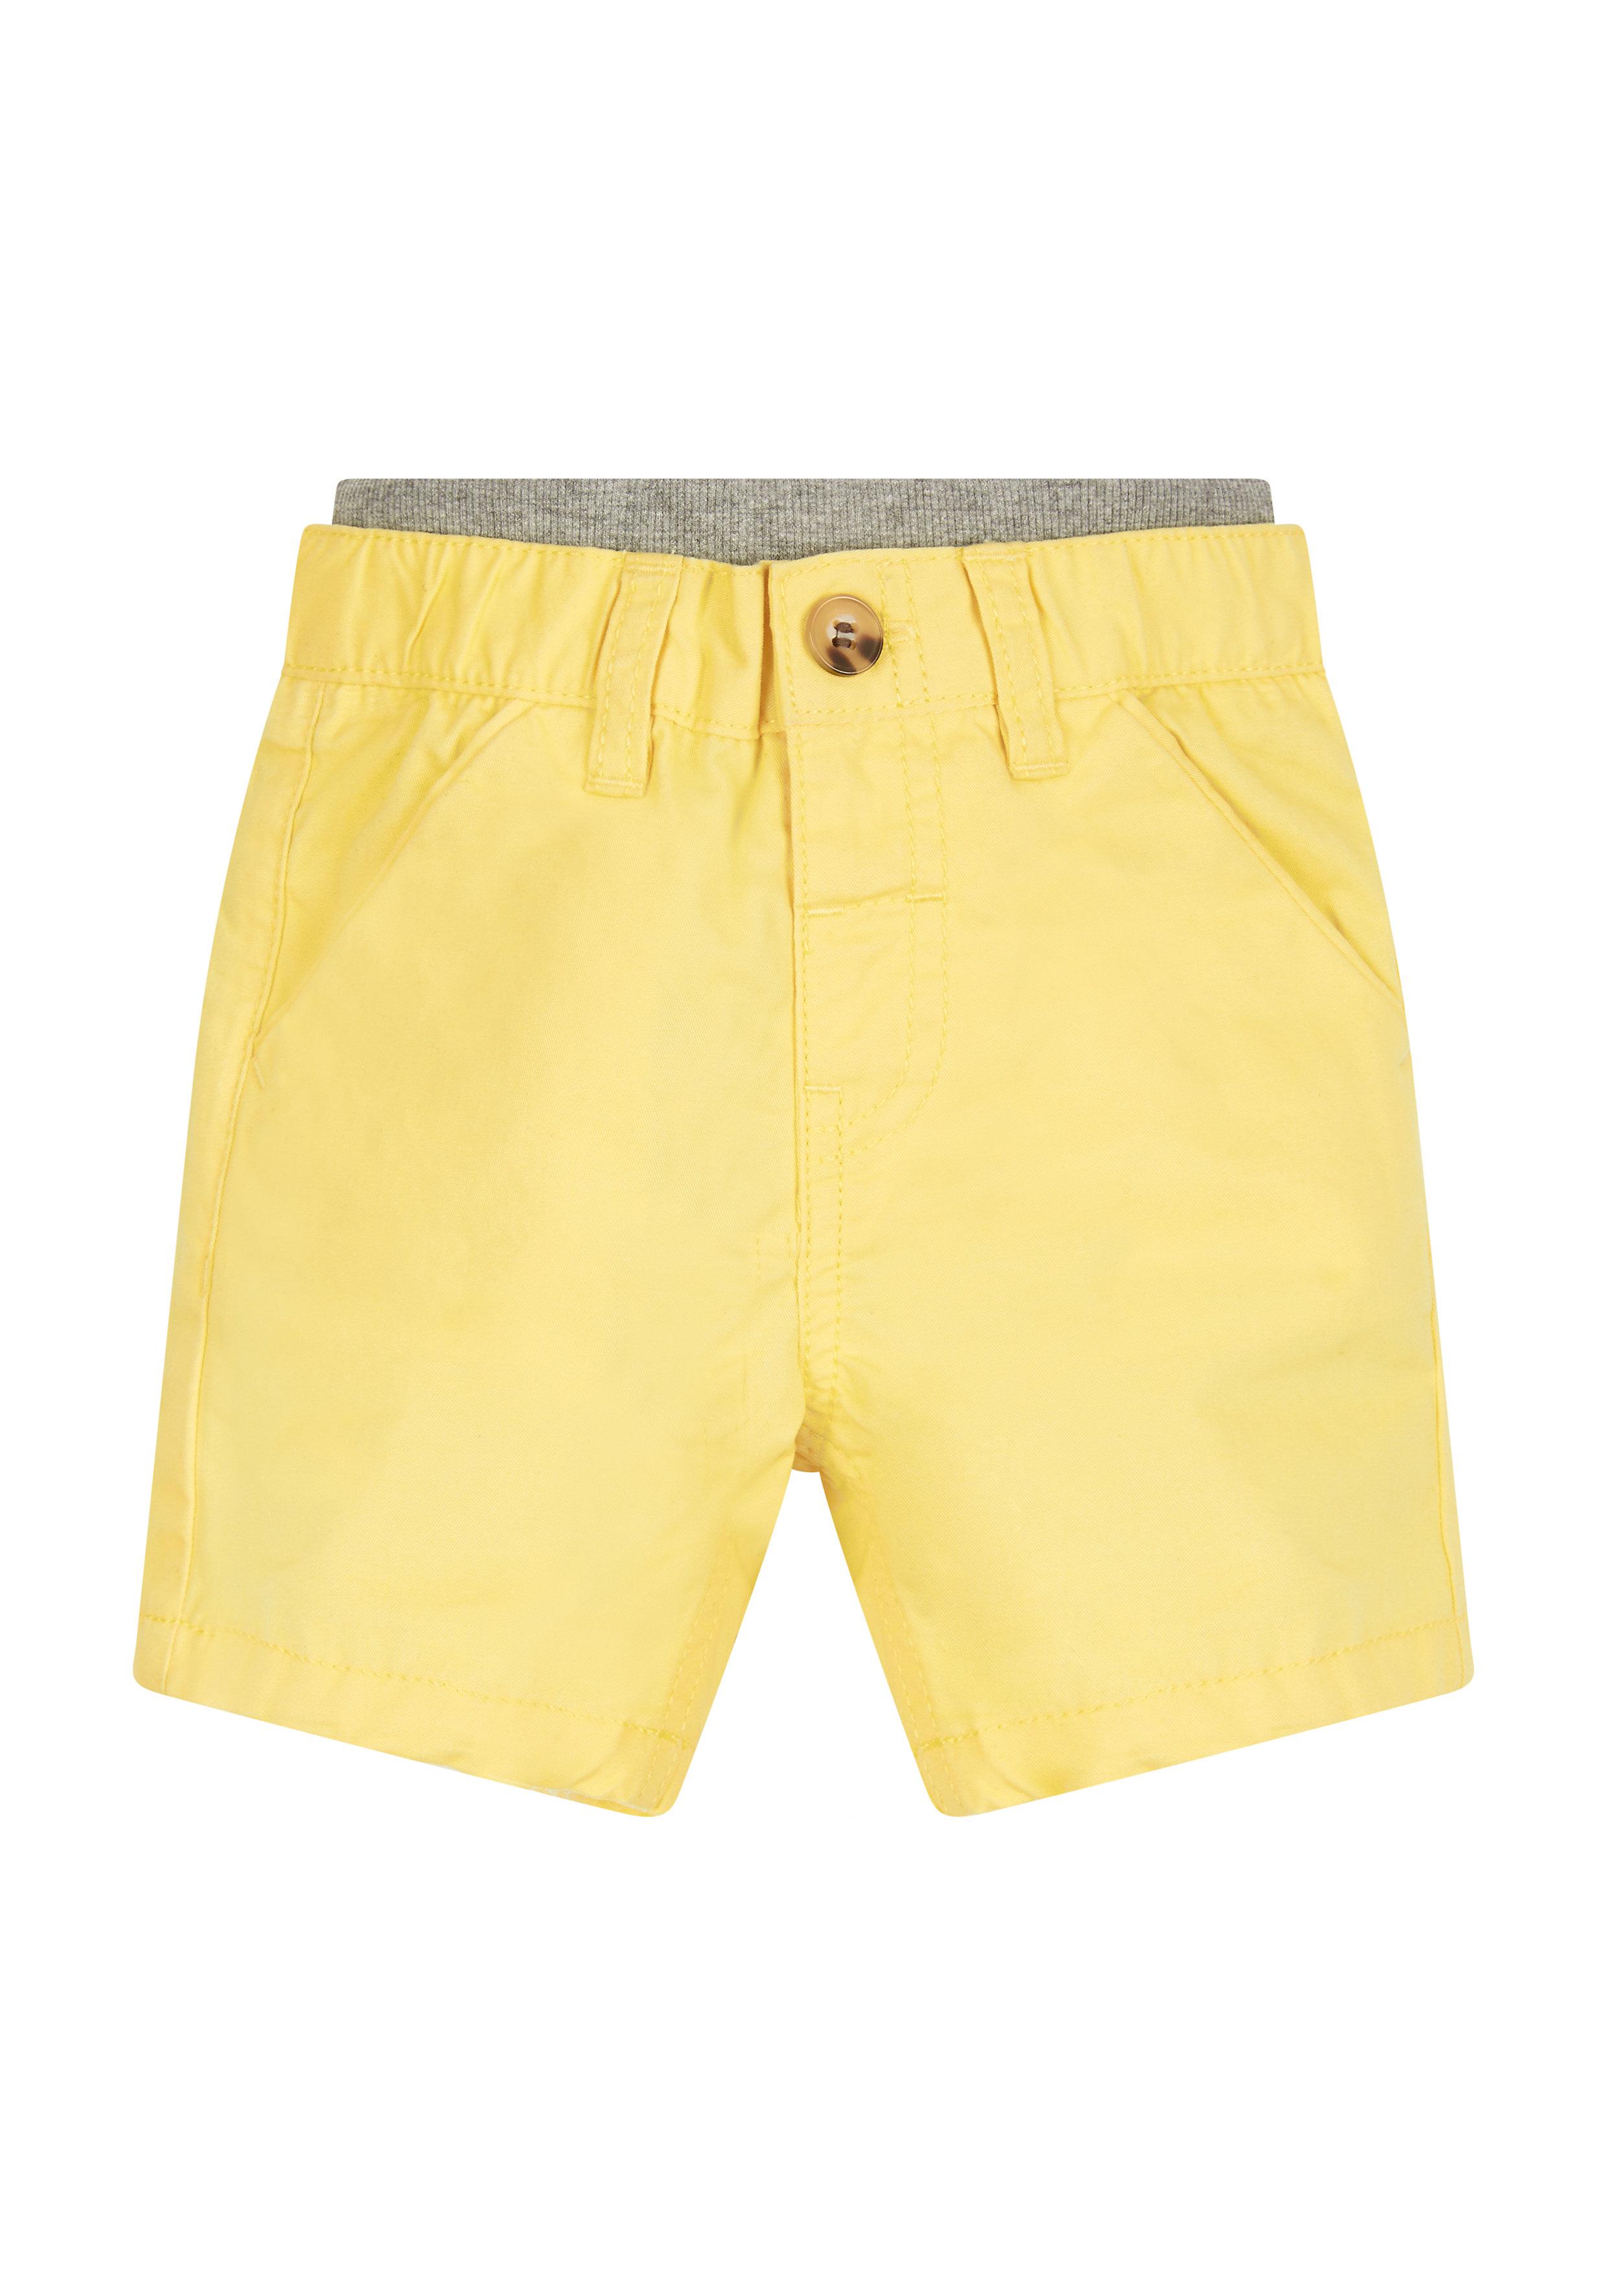 Mothercare | Boys Twill Shorts - Yellow